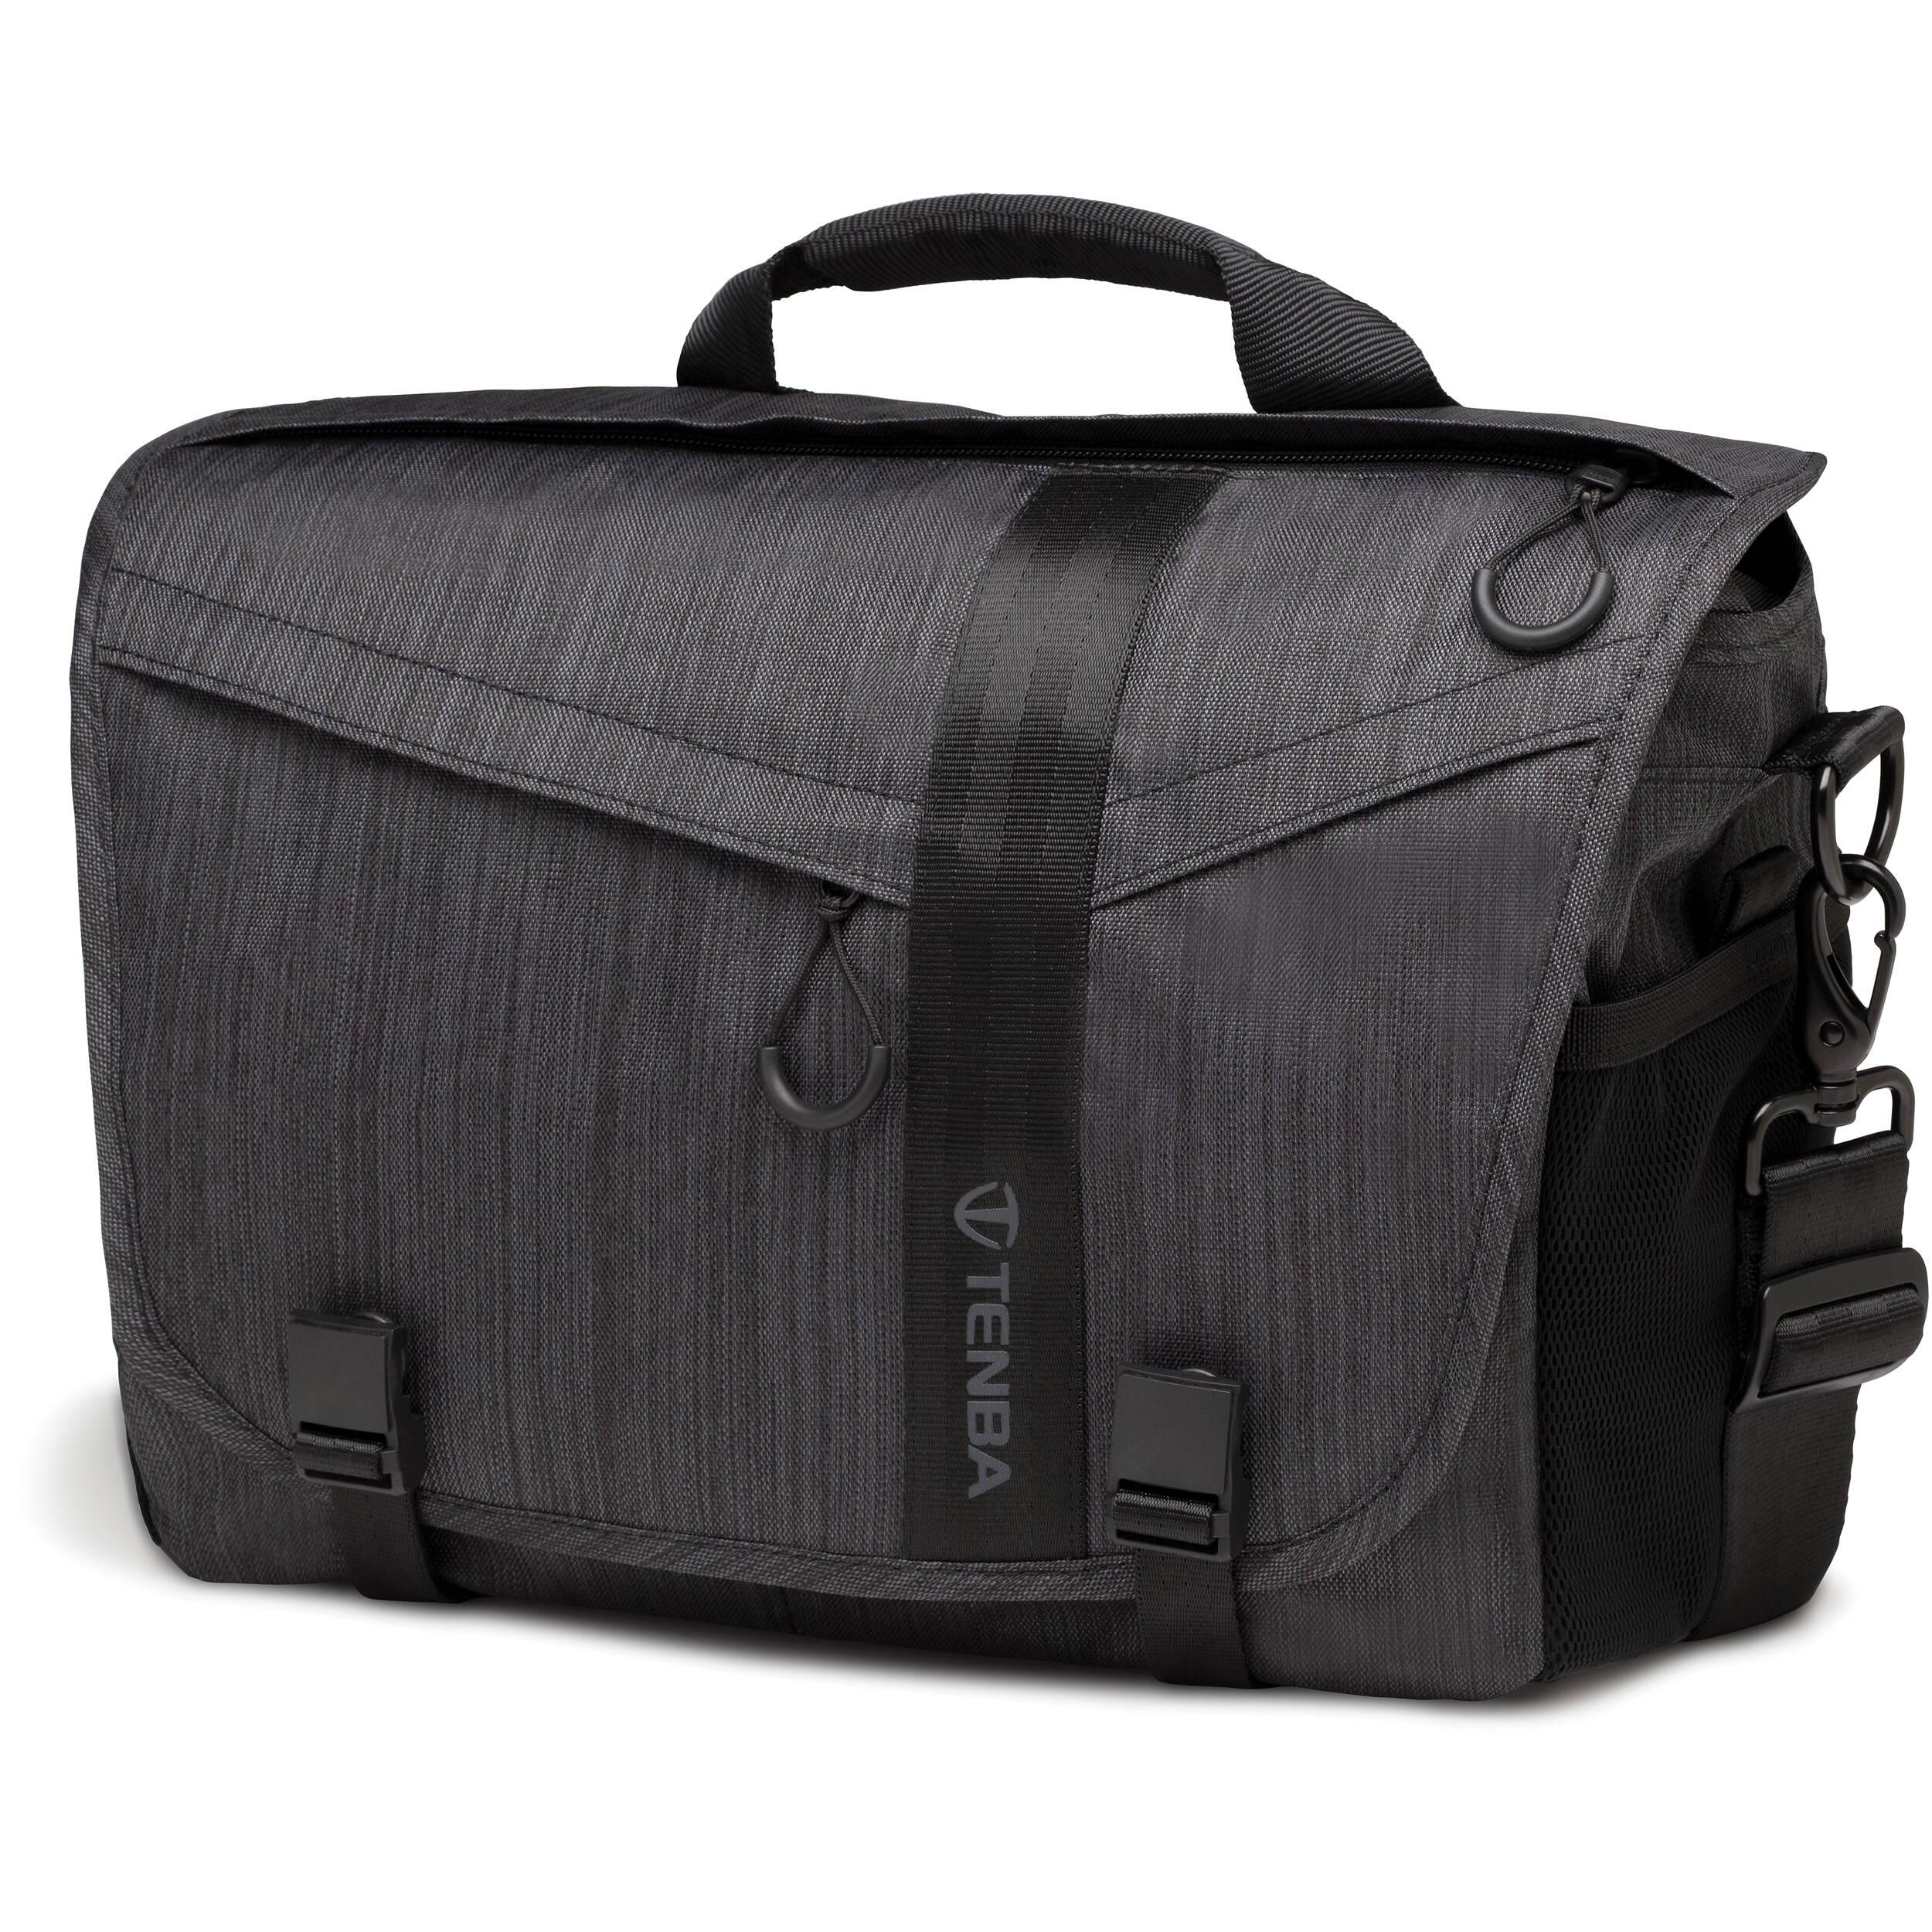 Tenba Dna 11 Messenger Bag Graphite